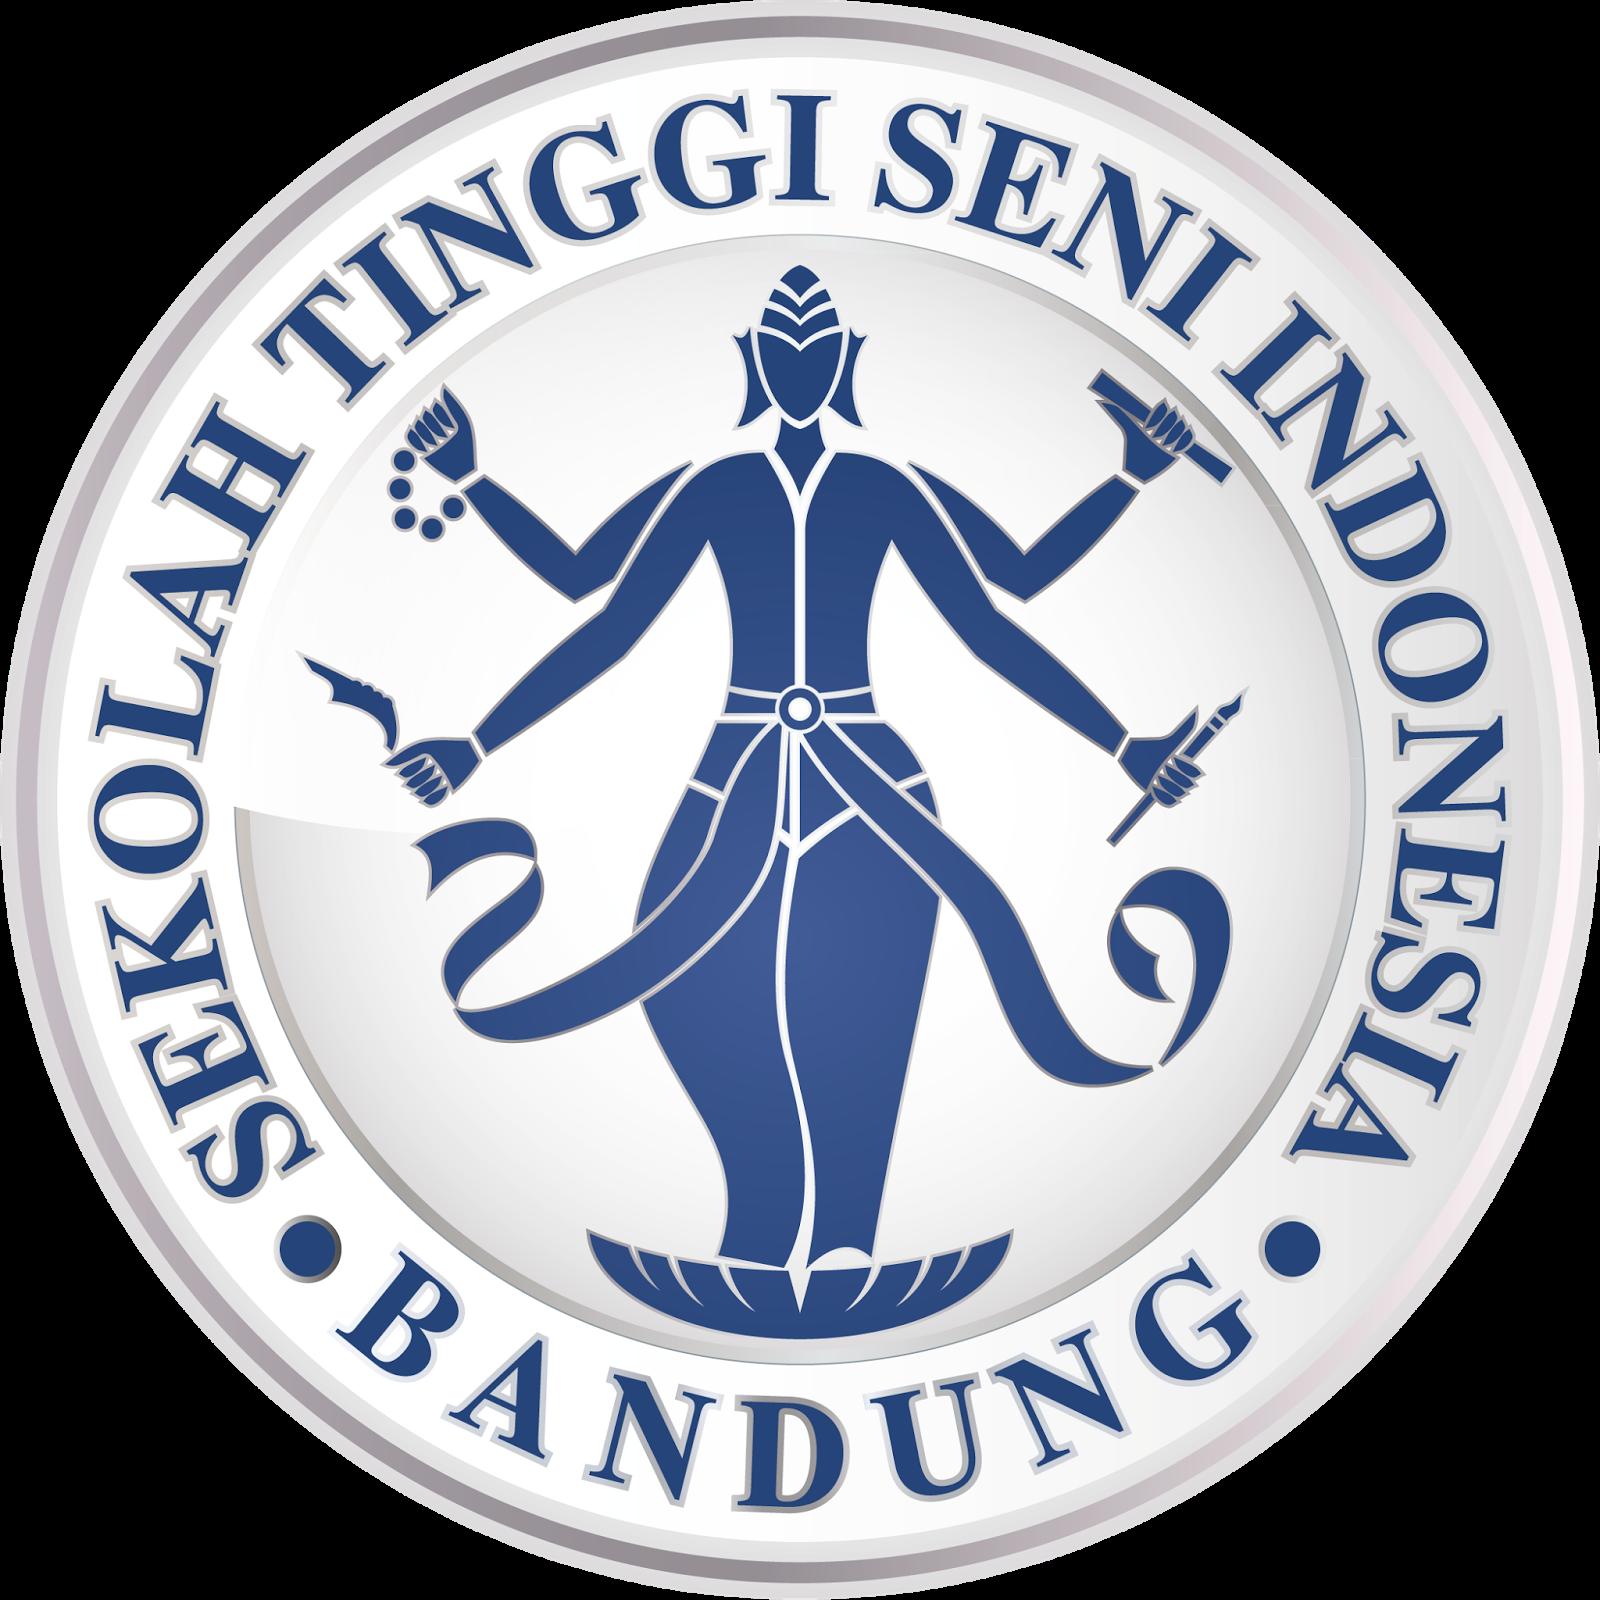 Logo STSI (Sekolah Tinggi Seni Indonesia) Bandung